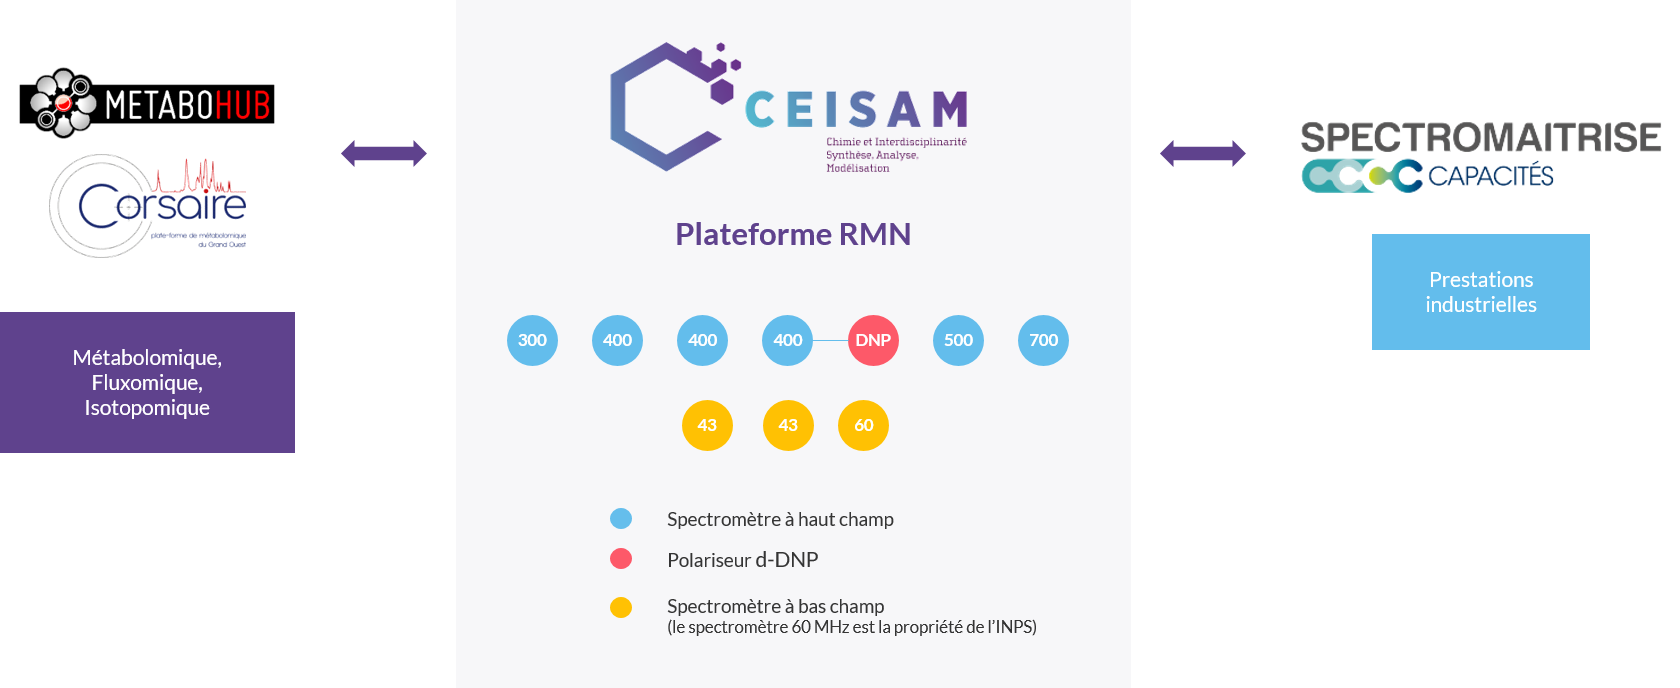 CEISAM Plateforme RMN